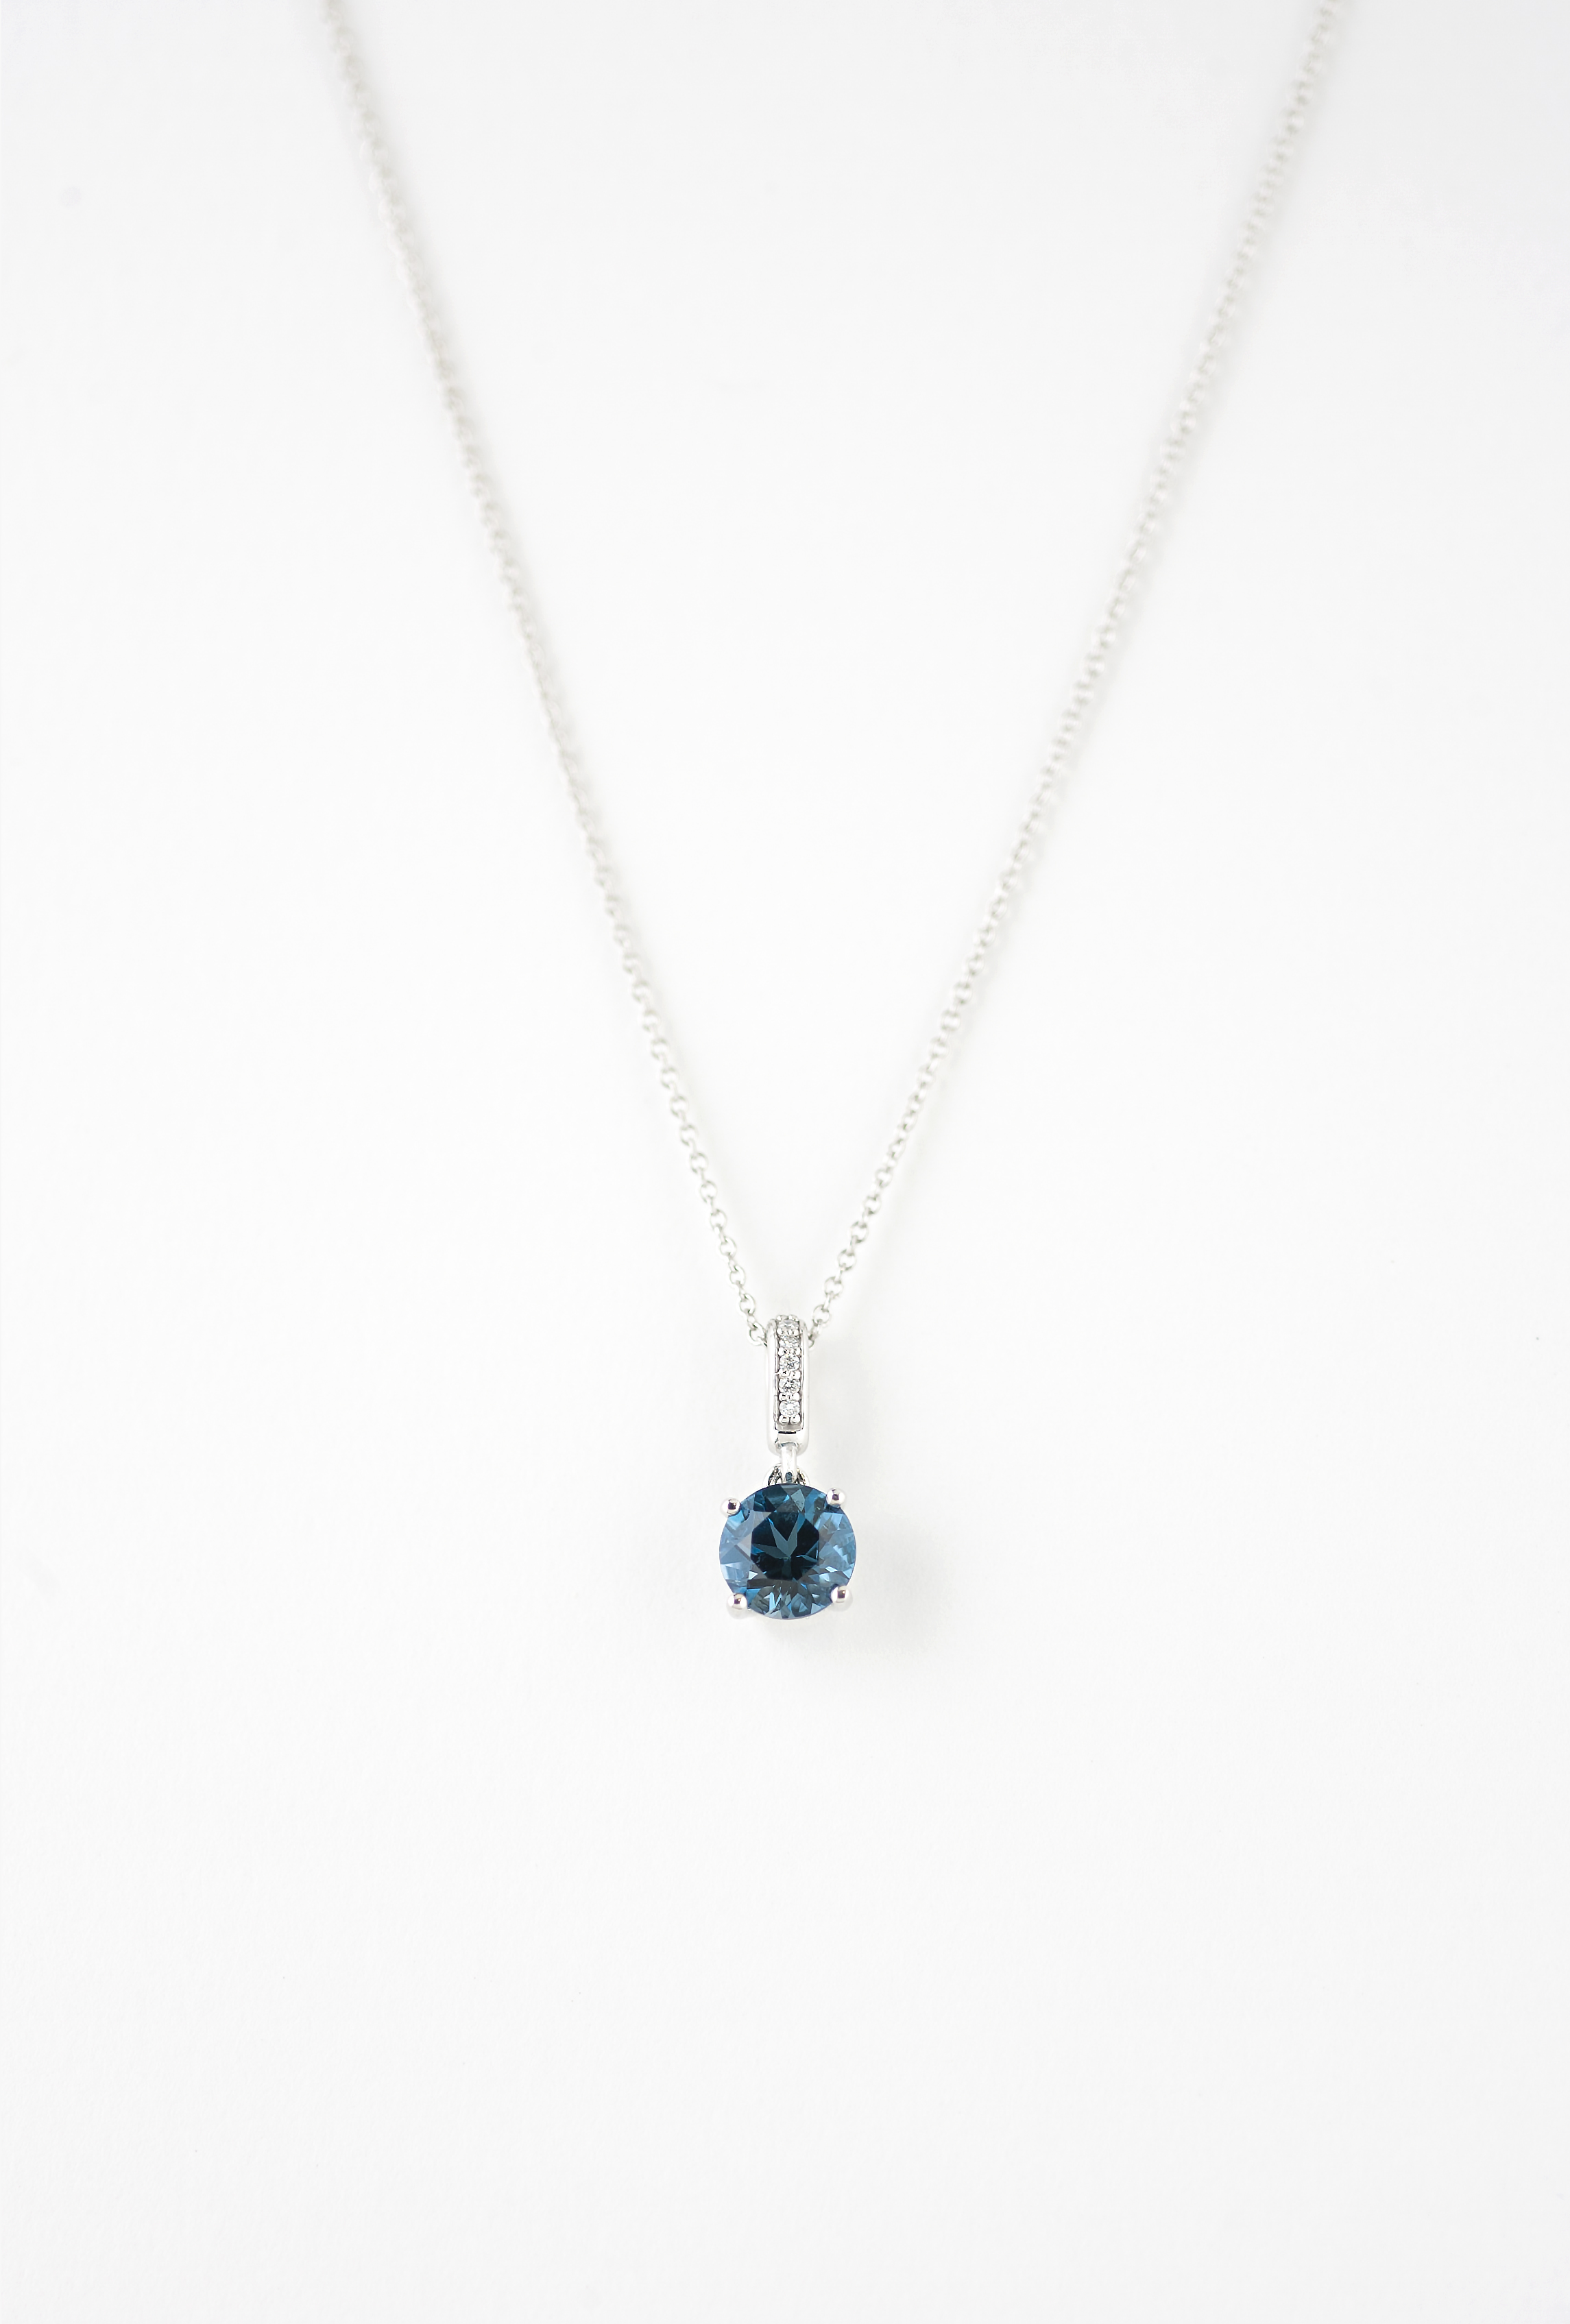 Blue topaz and diamond pendent